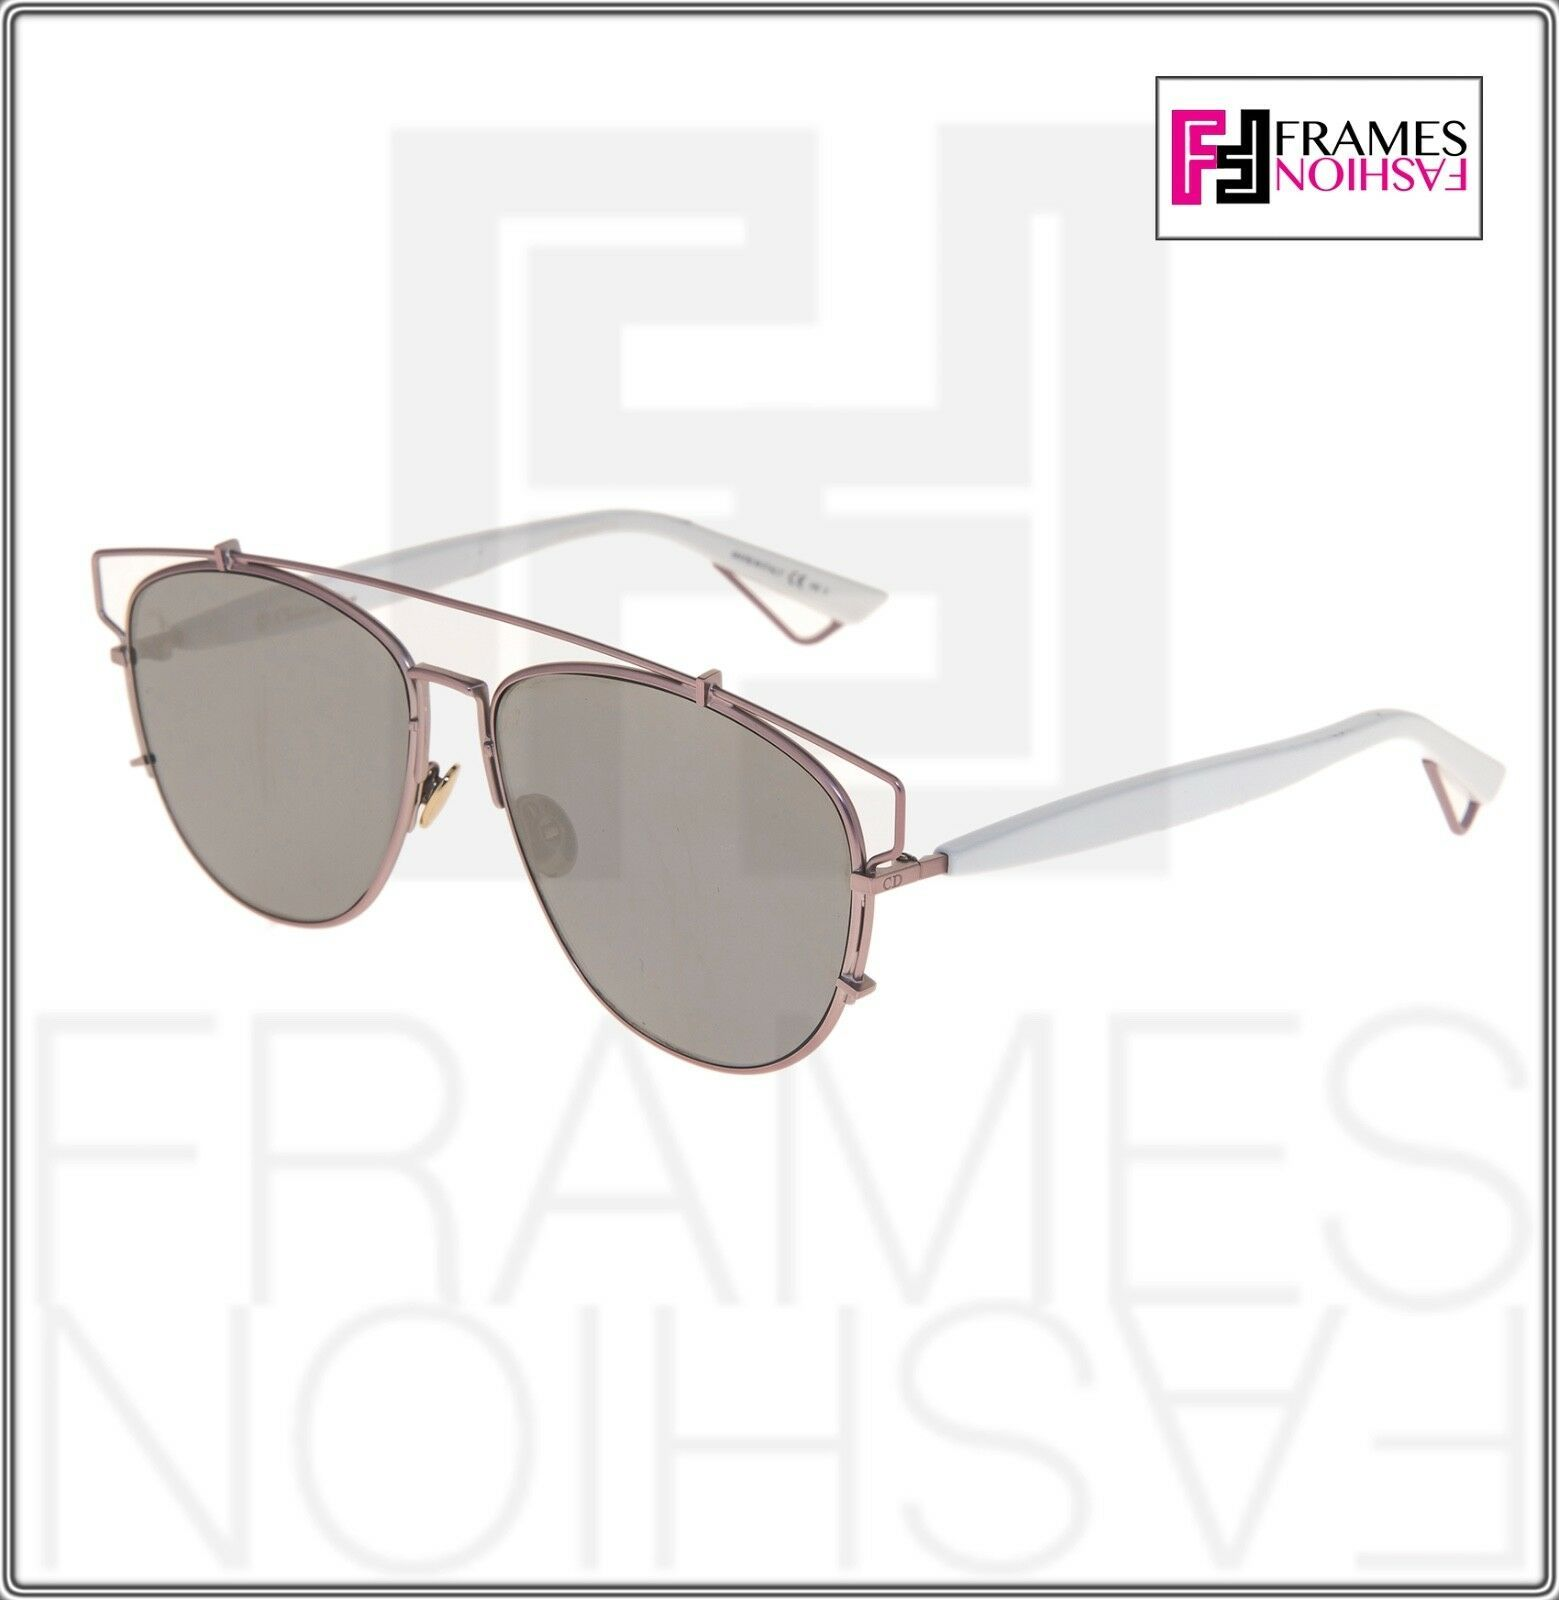 CHRISTIAN DIOR TECHNOLOGIC White Lilac Flash Mirrored Sunglasses DIORTECHNOLOGIC image 7